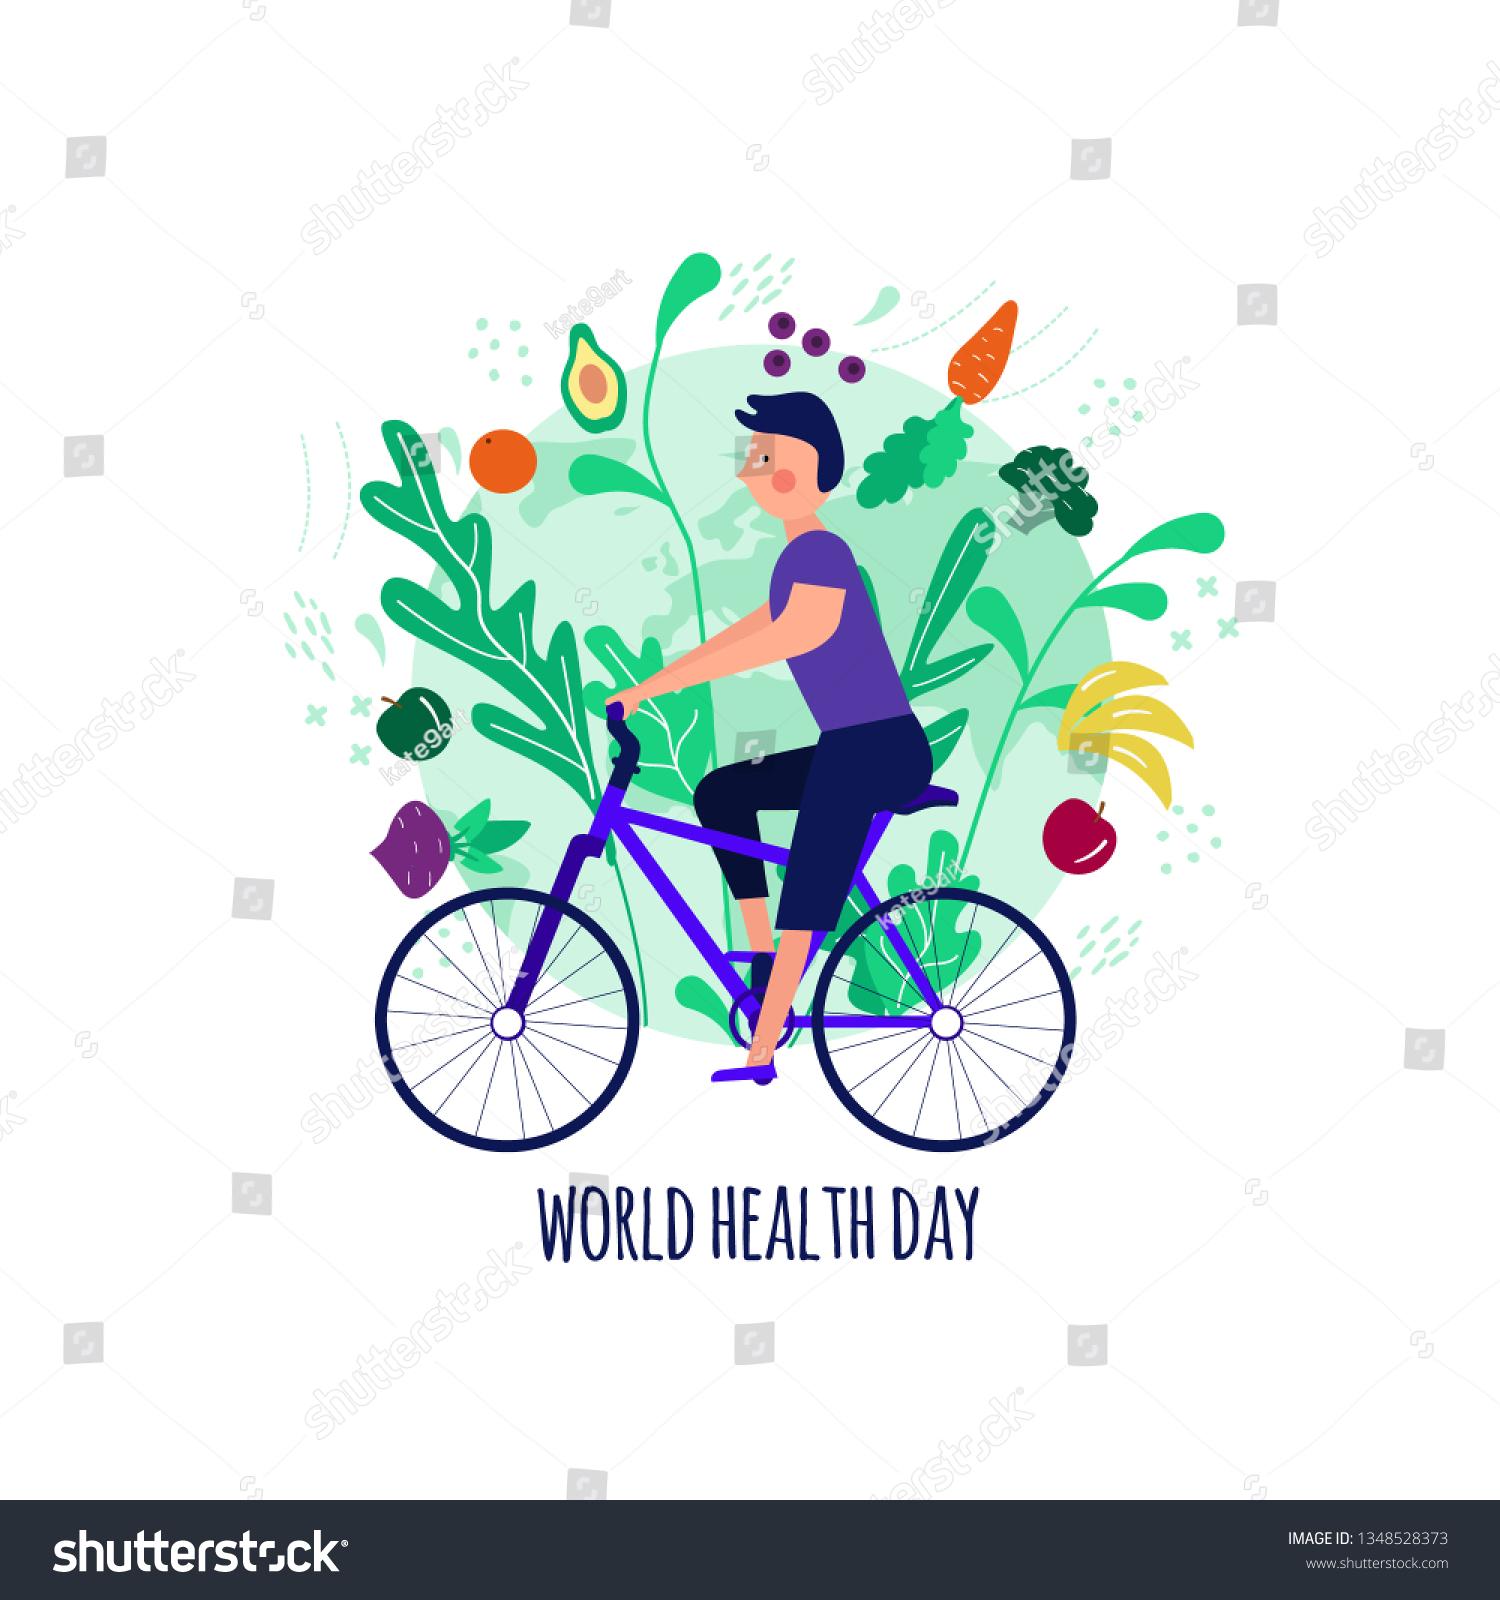 happy world health day clipart